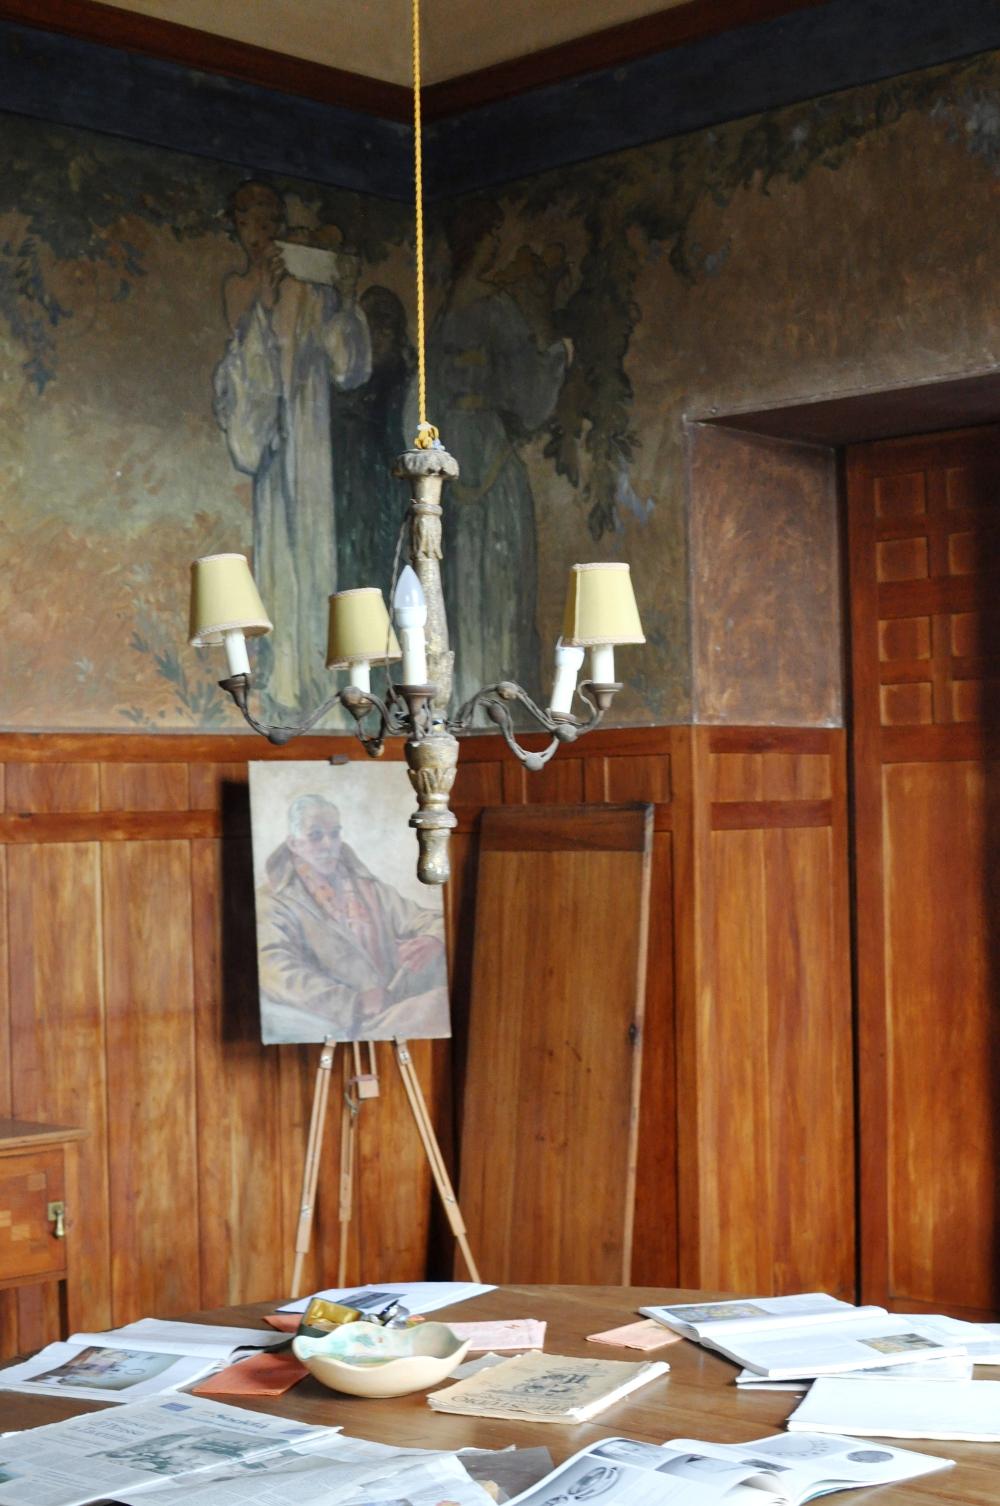 casa-cuseni-camera-inglese-brangwyn-taormina-rocaille-blog